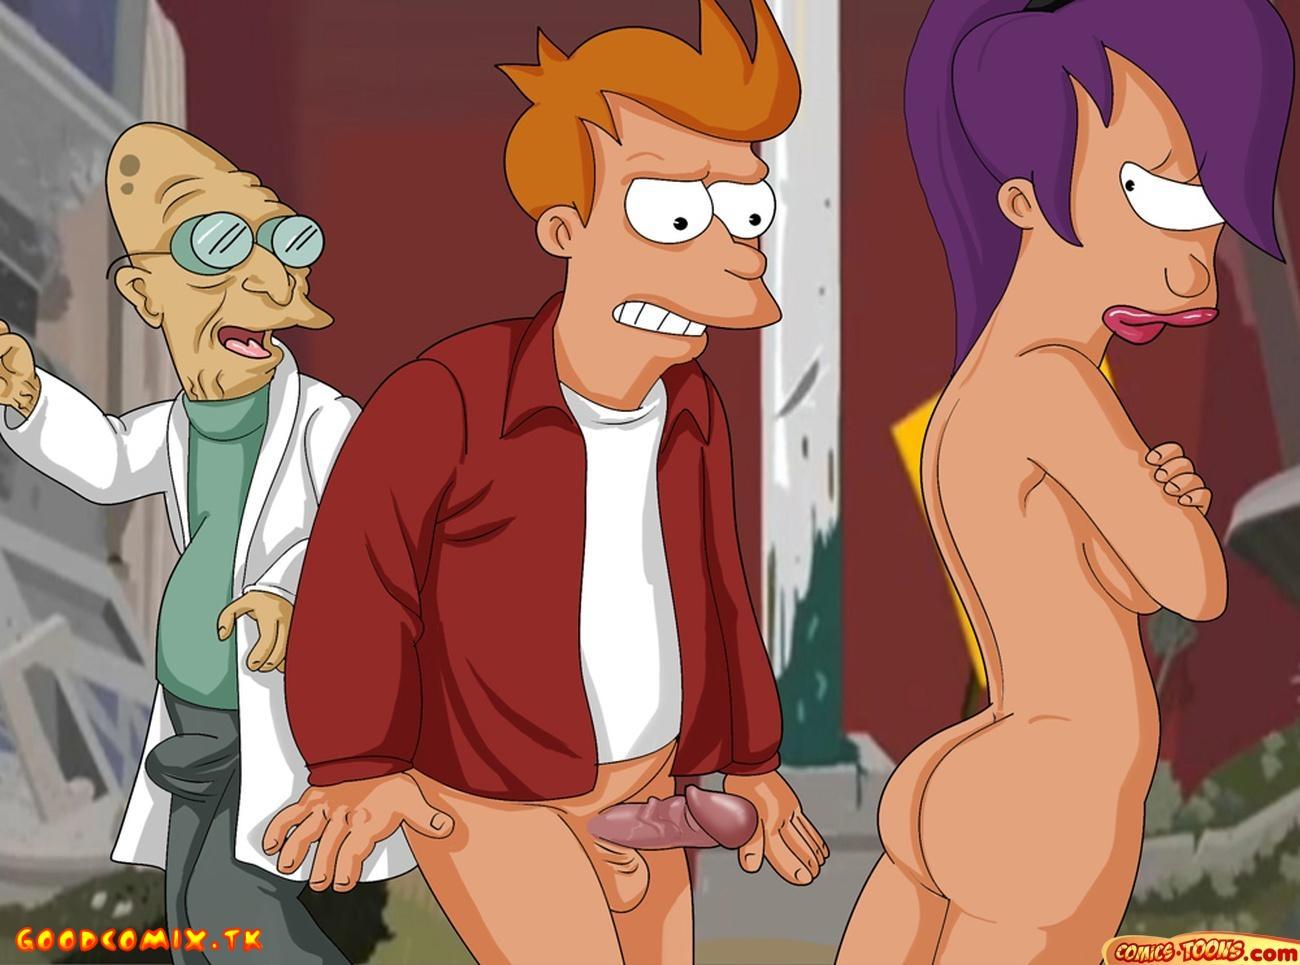 Goodcomix Futurama - [Comics-Toons] - How Lift Your Spirits [NOT FULL]